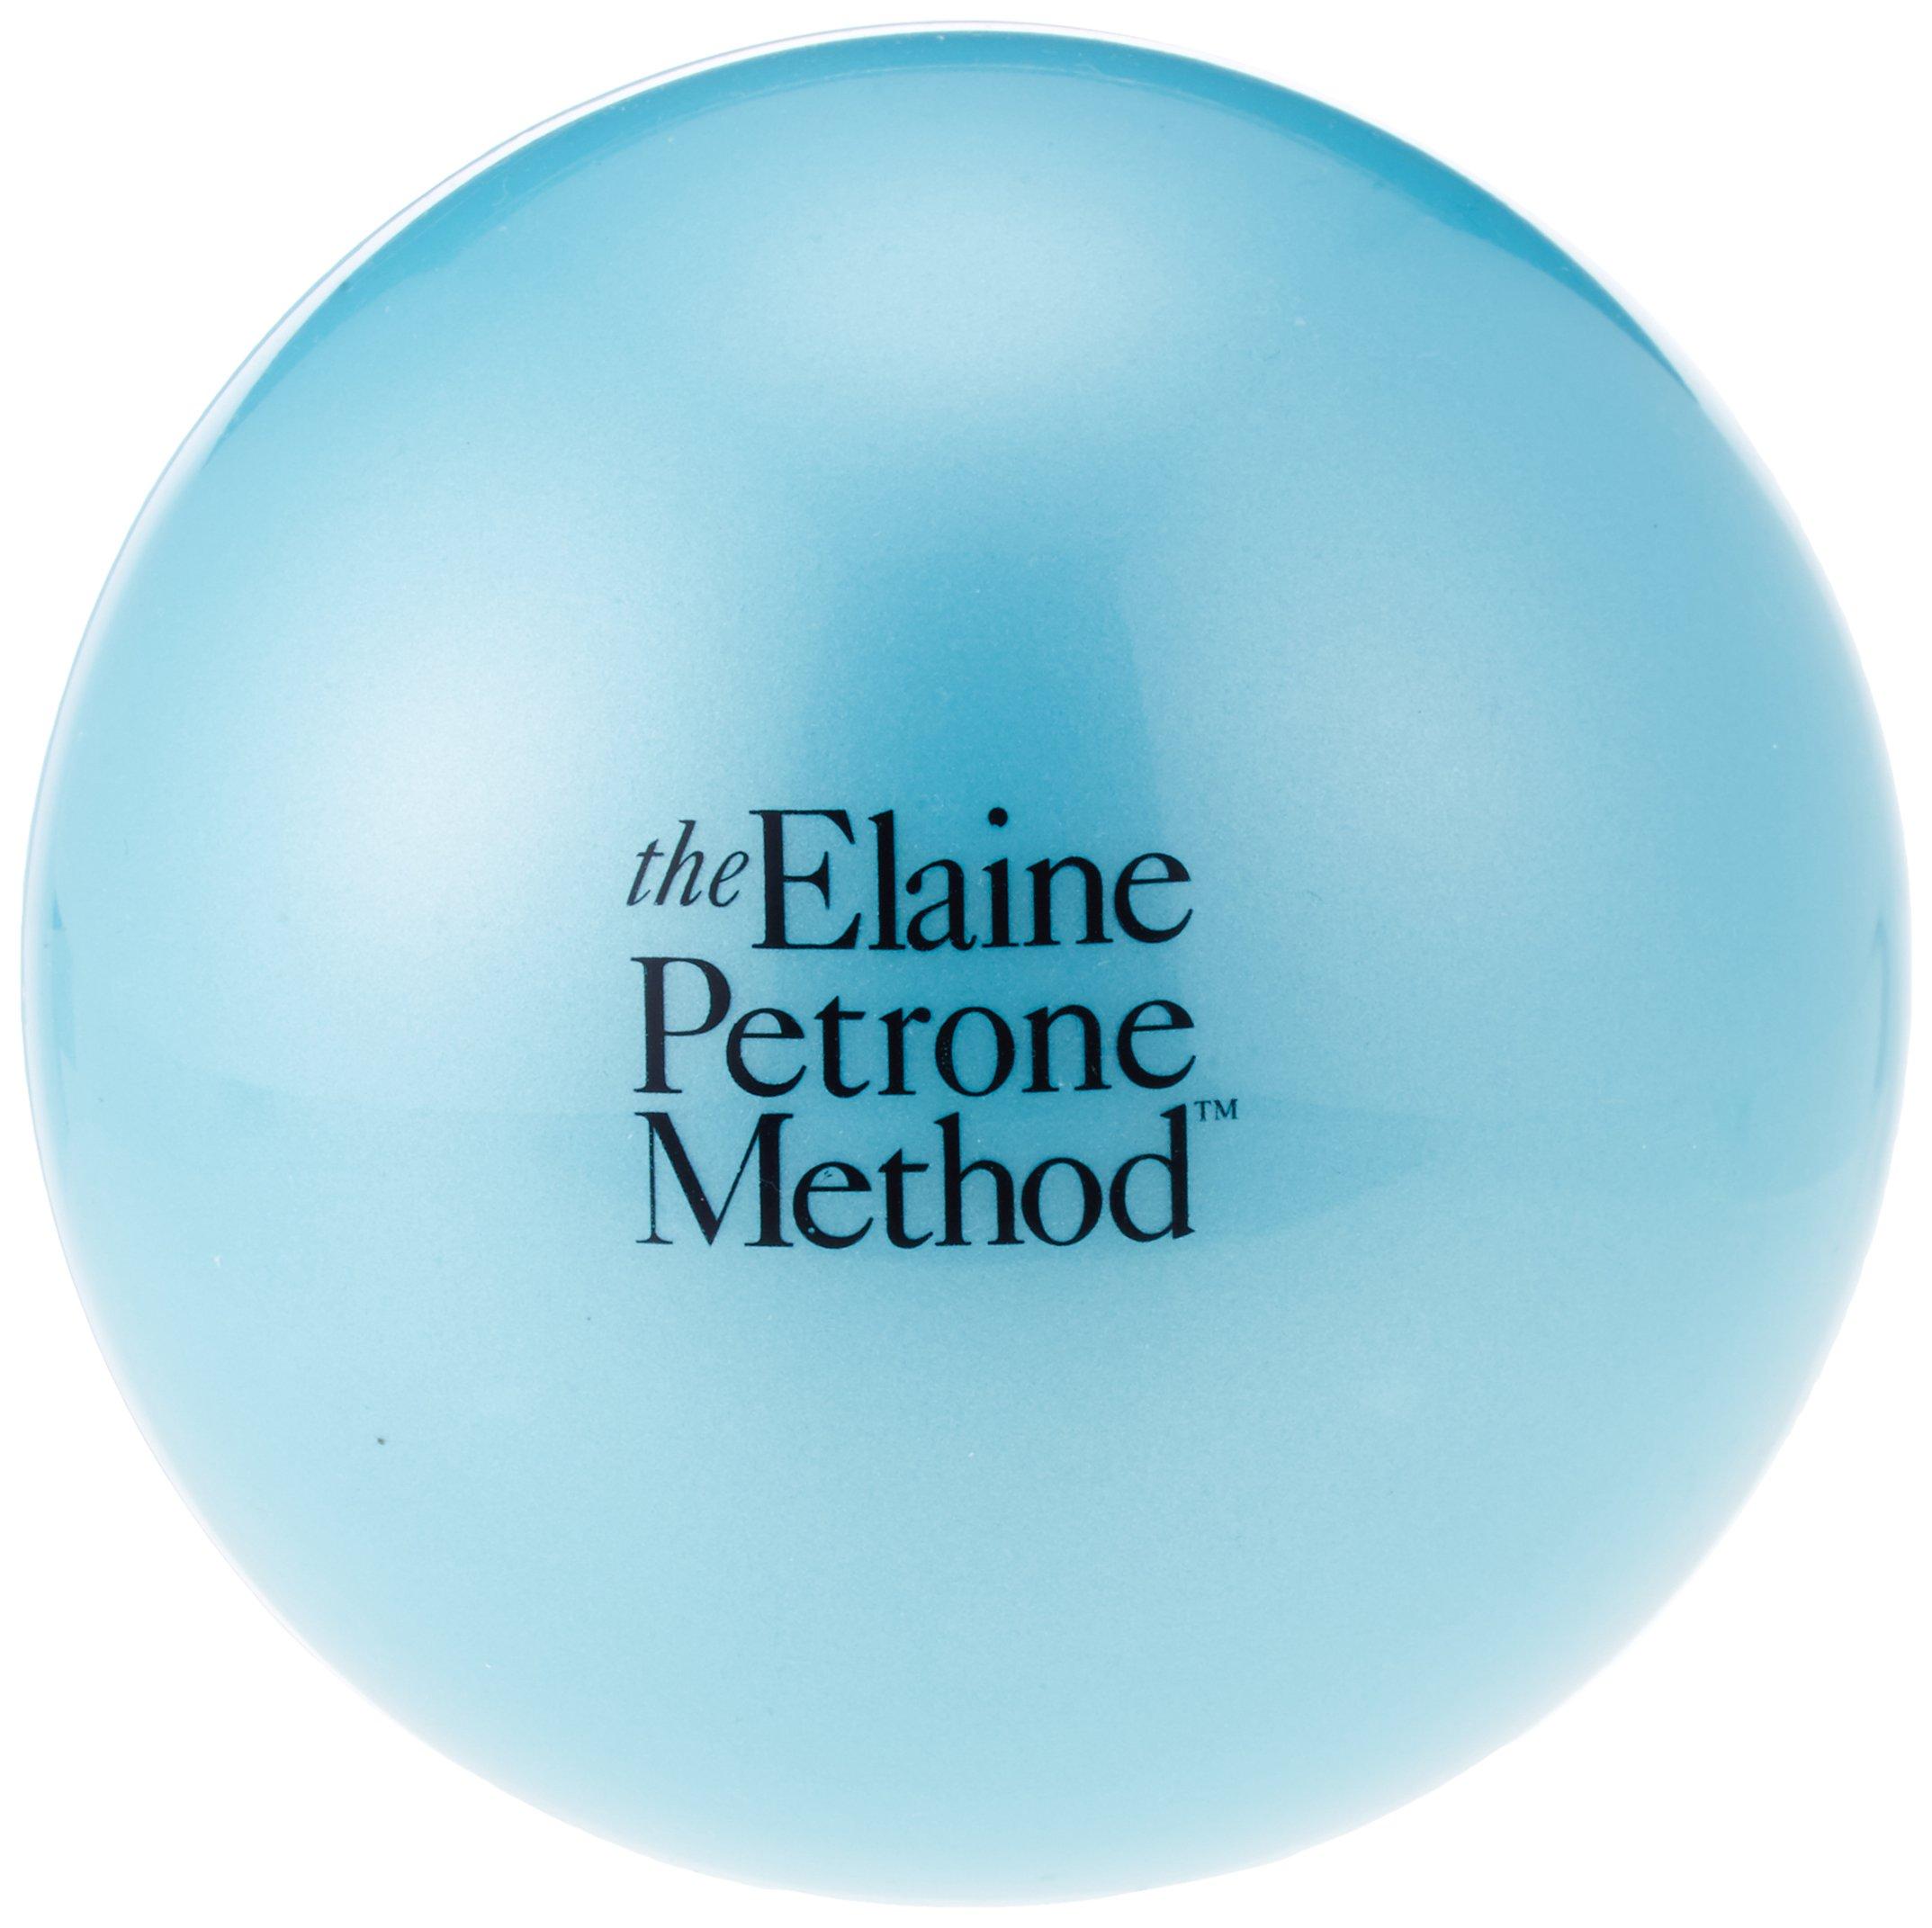 The Elaine Petrone Method - Stop the Clock. DVD & Ball